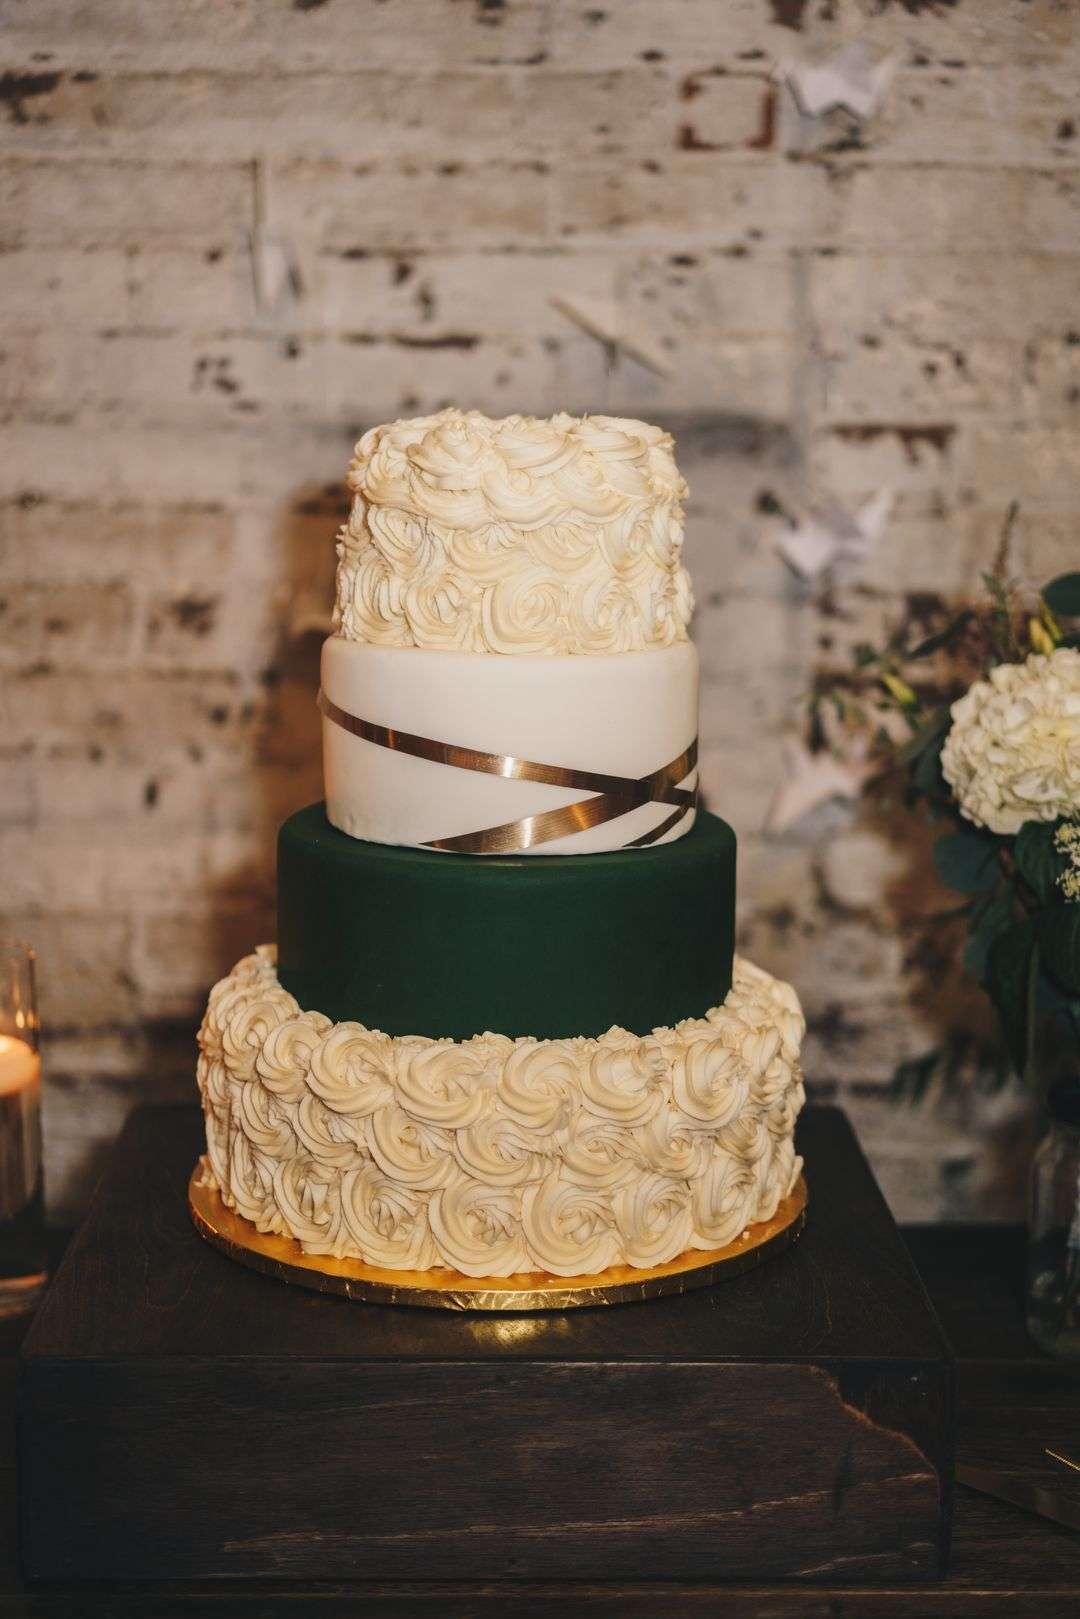 emerald, gold and white wedding cake